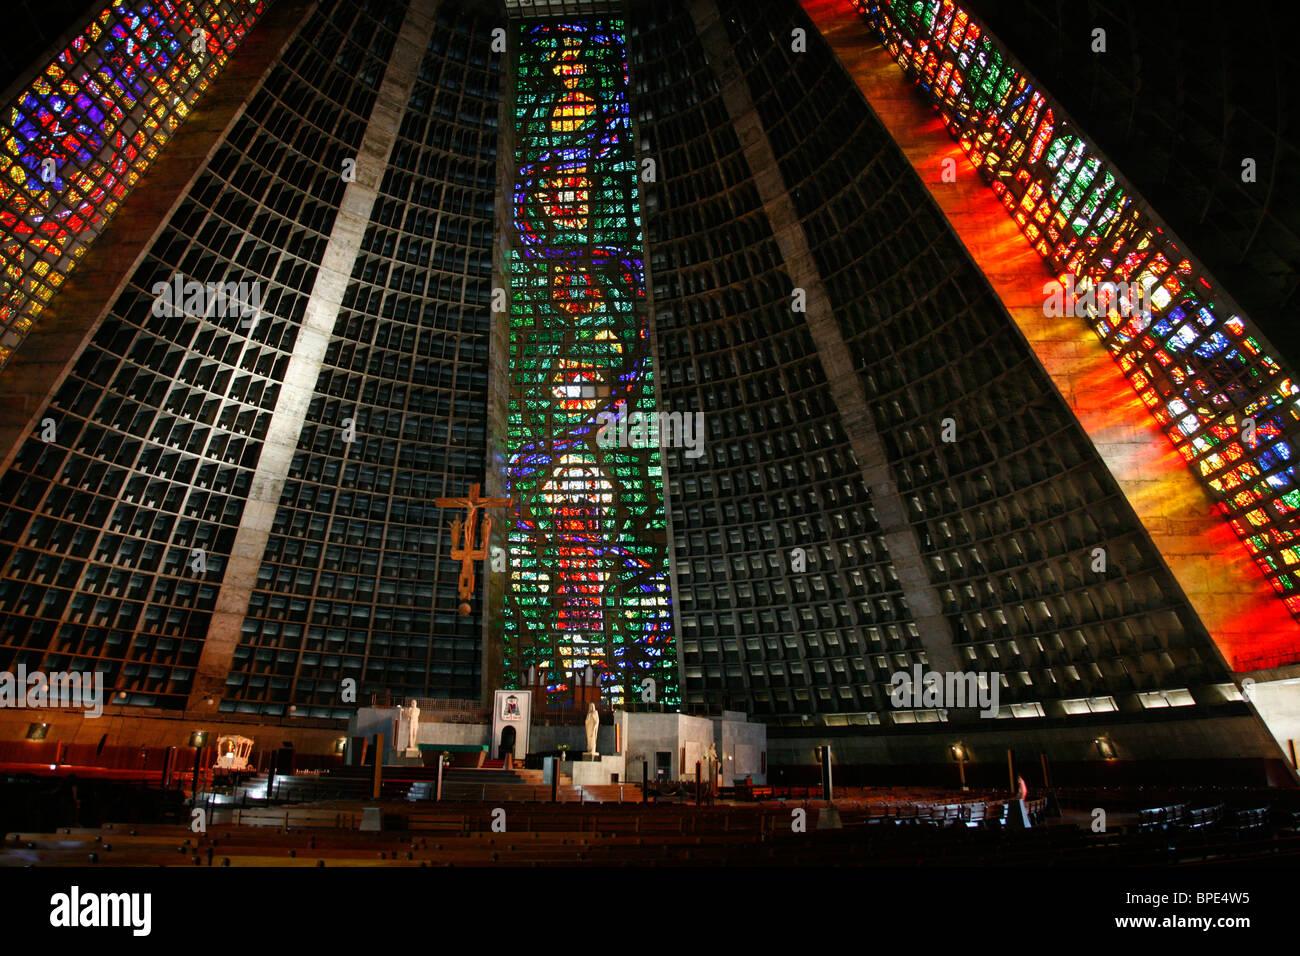 Catedral Metropolitana, Rio de Janeiro, Brazil. - Stock Image